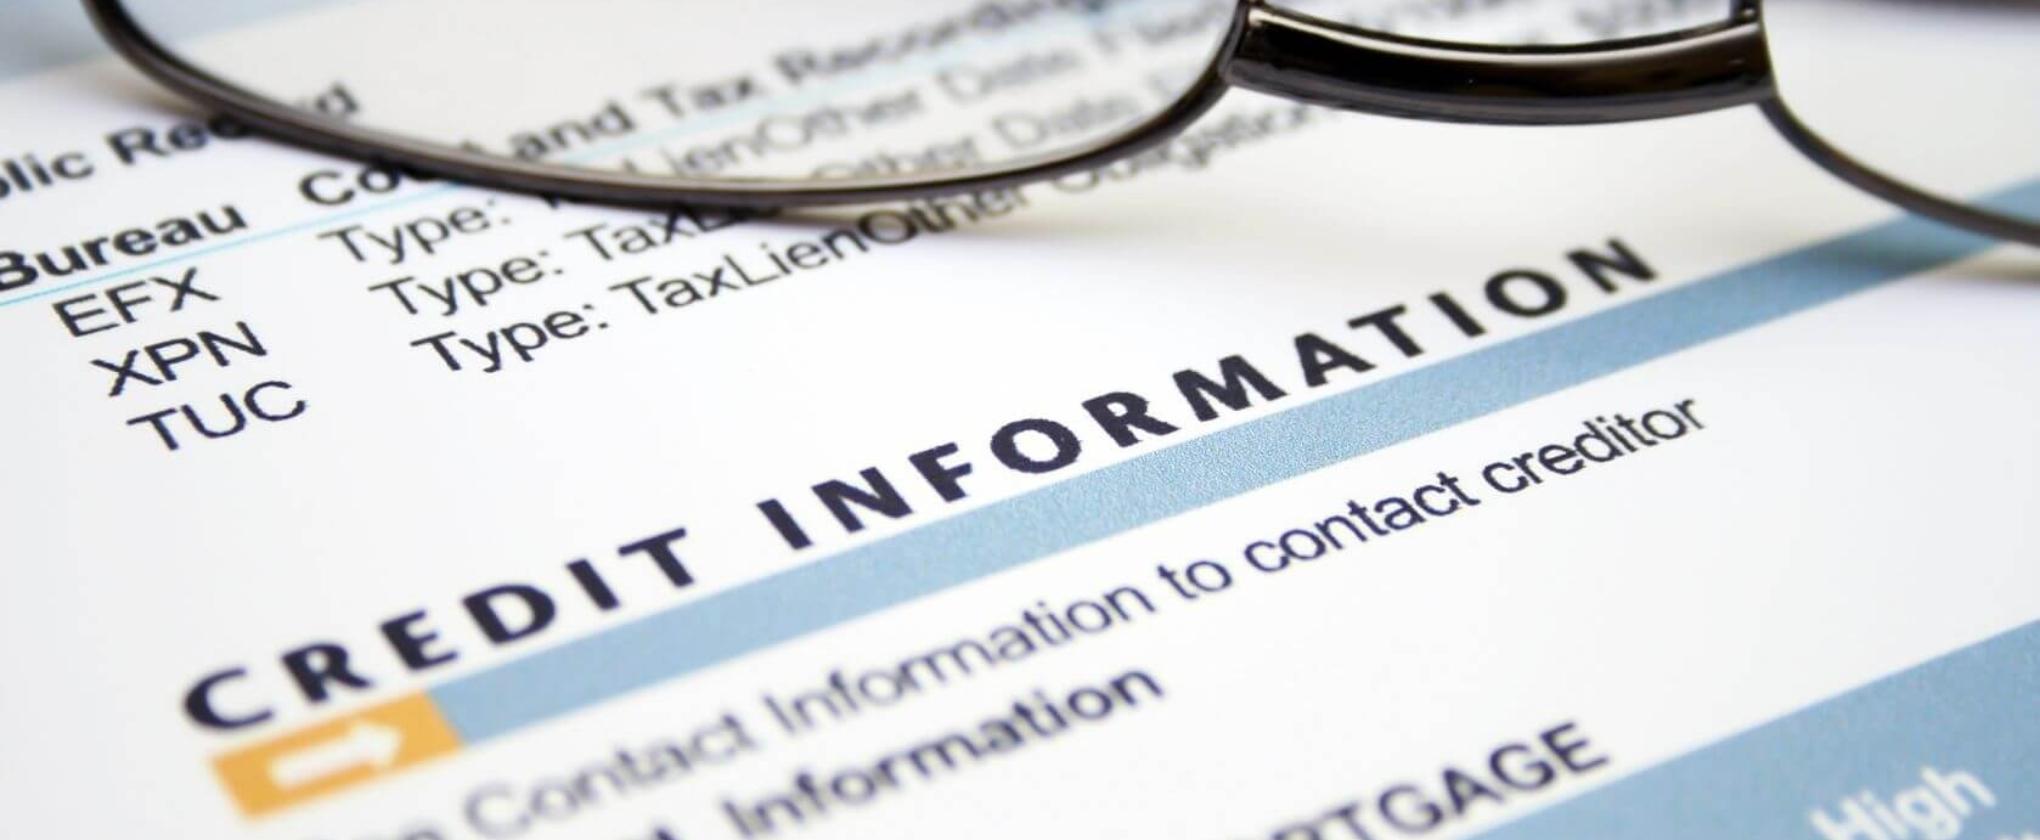 Handling New Customer Credit Applications